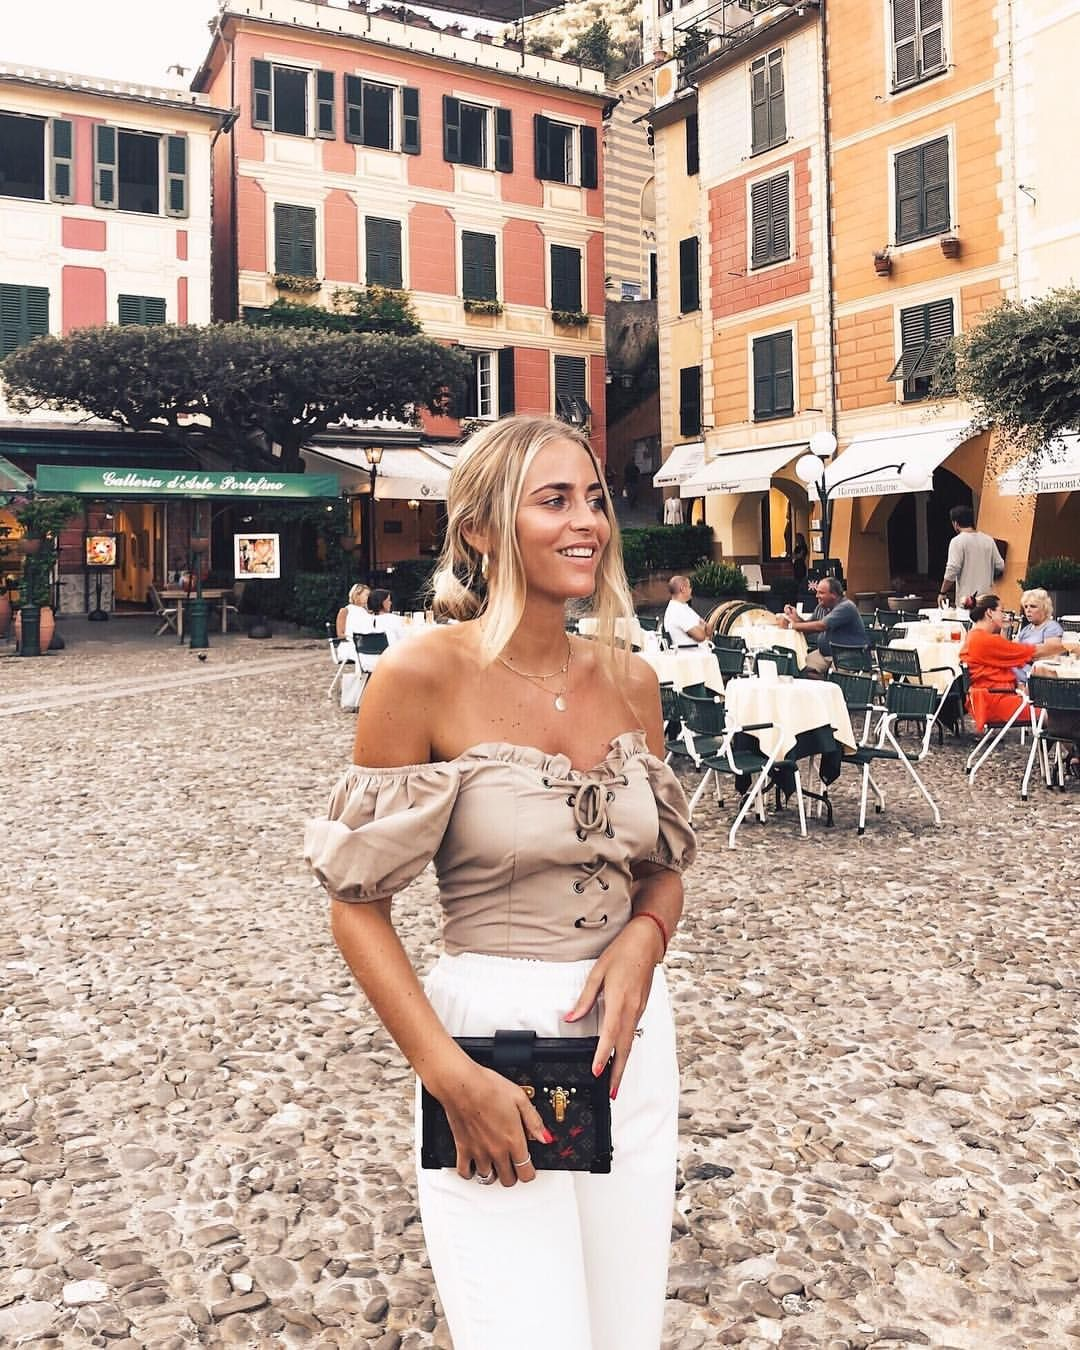 890ec6936fdd9 ... ▷ Janni Olsson Delér -  jannid Instagram Profile    stories